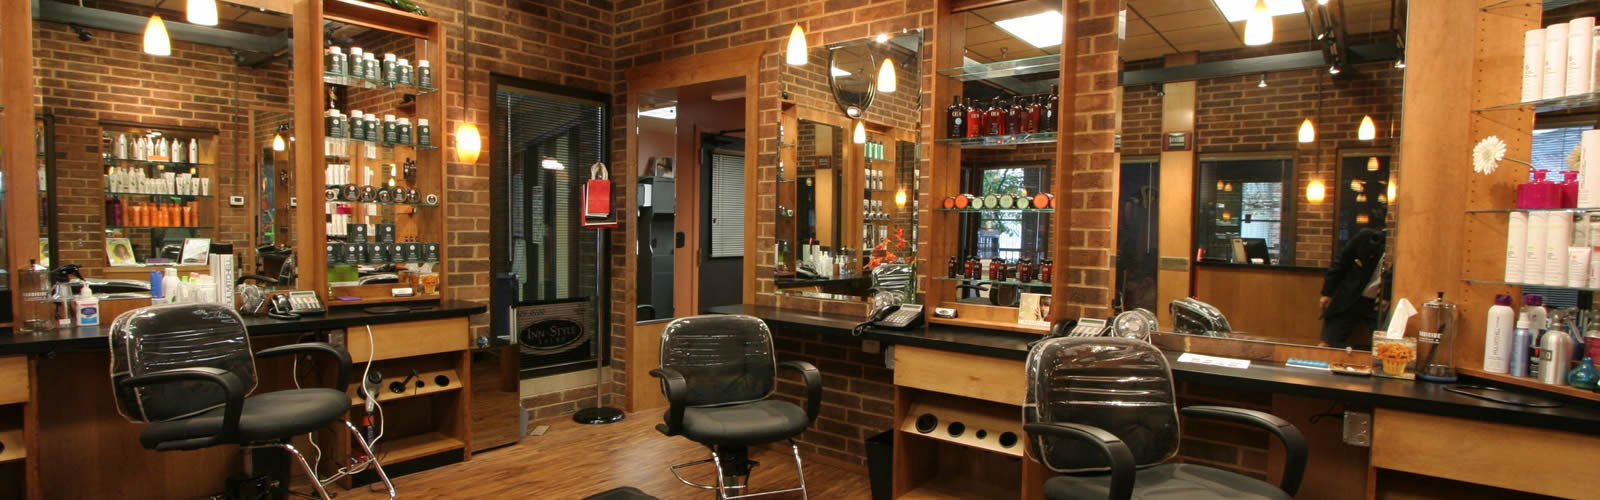 Ann Arbor MI Professional Hair Salon Inn Style Salon